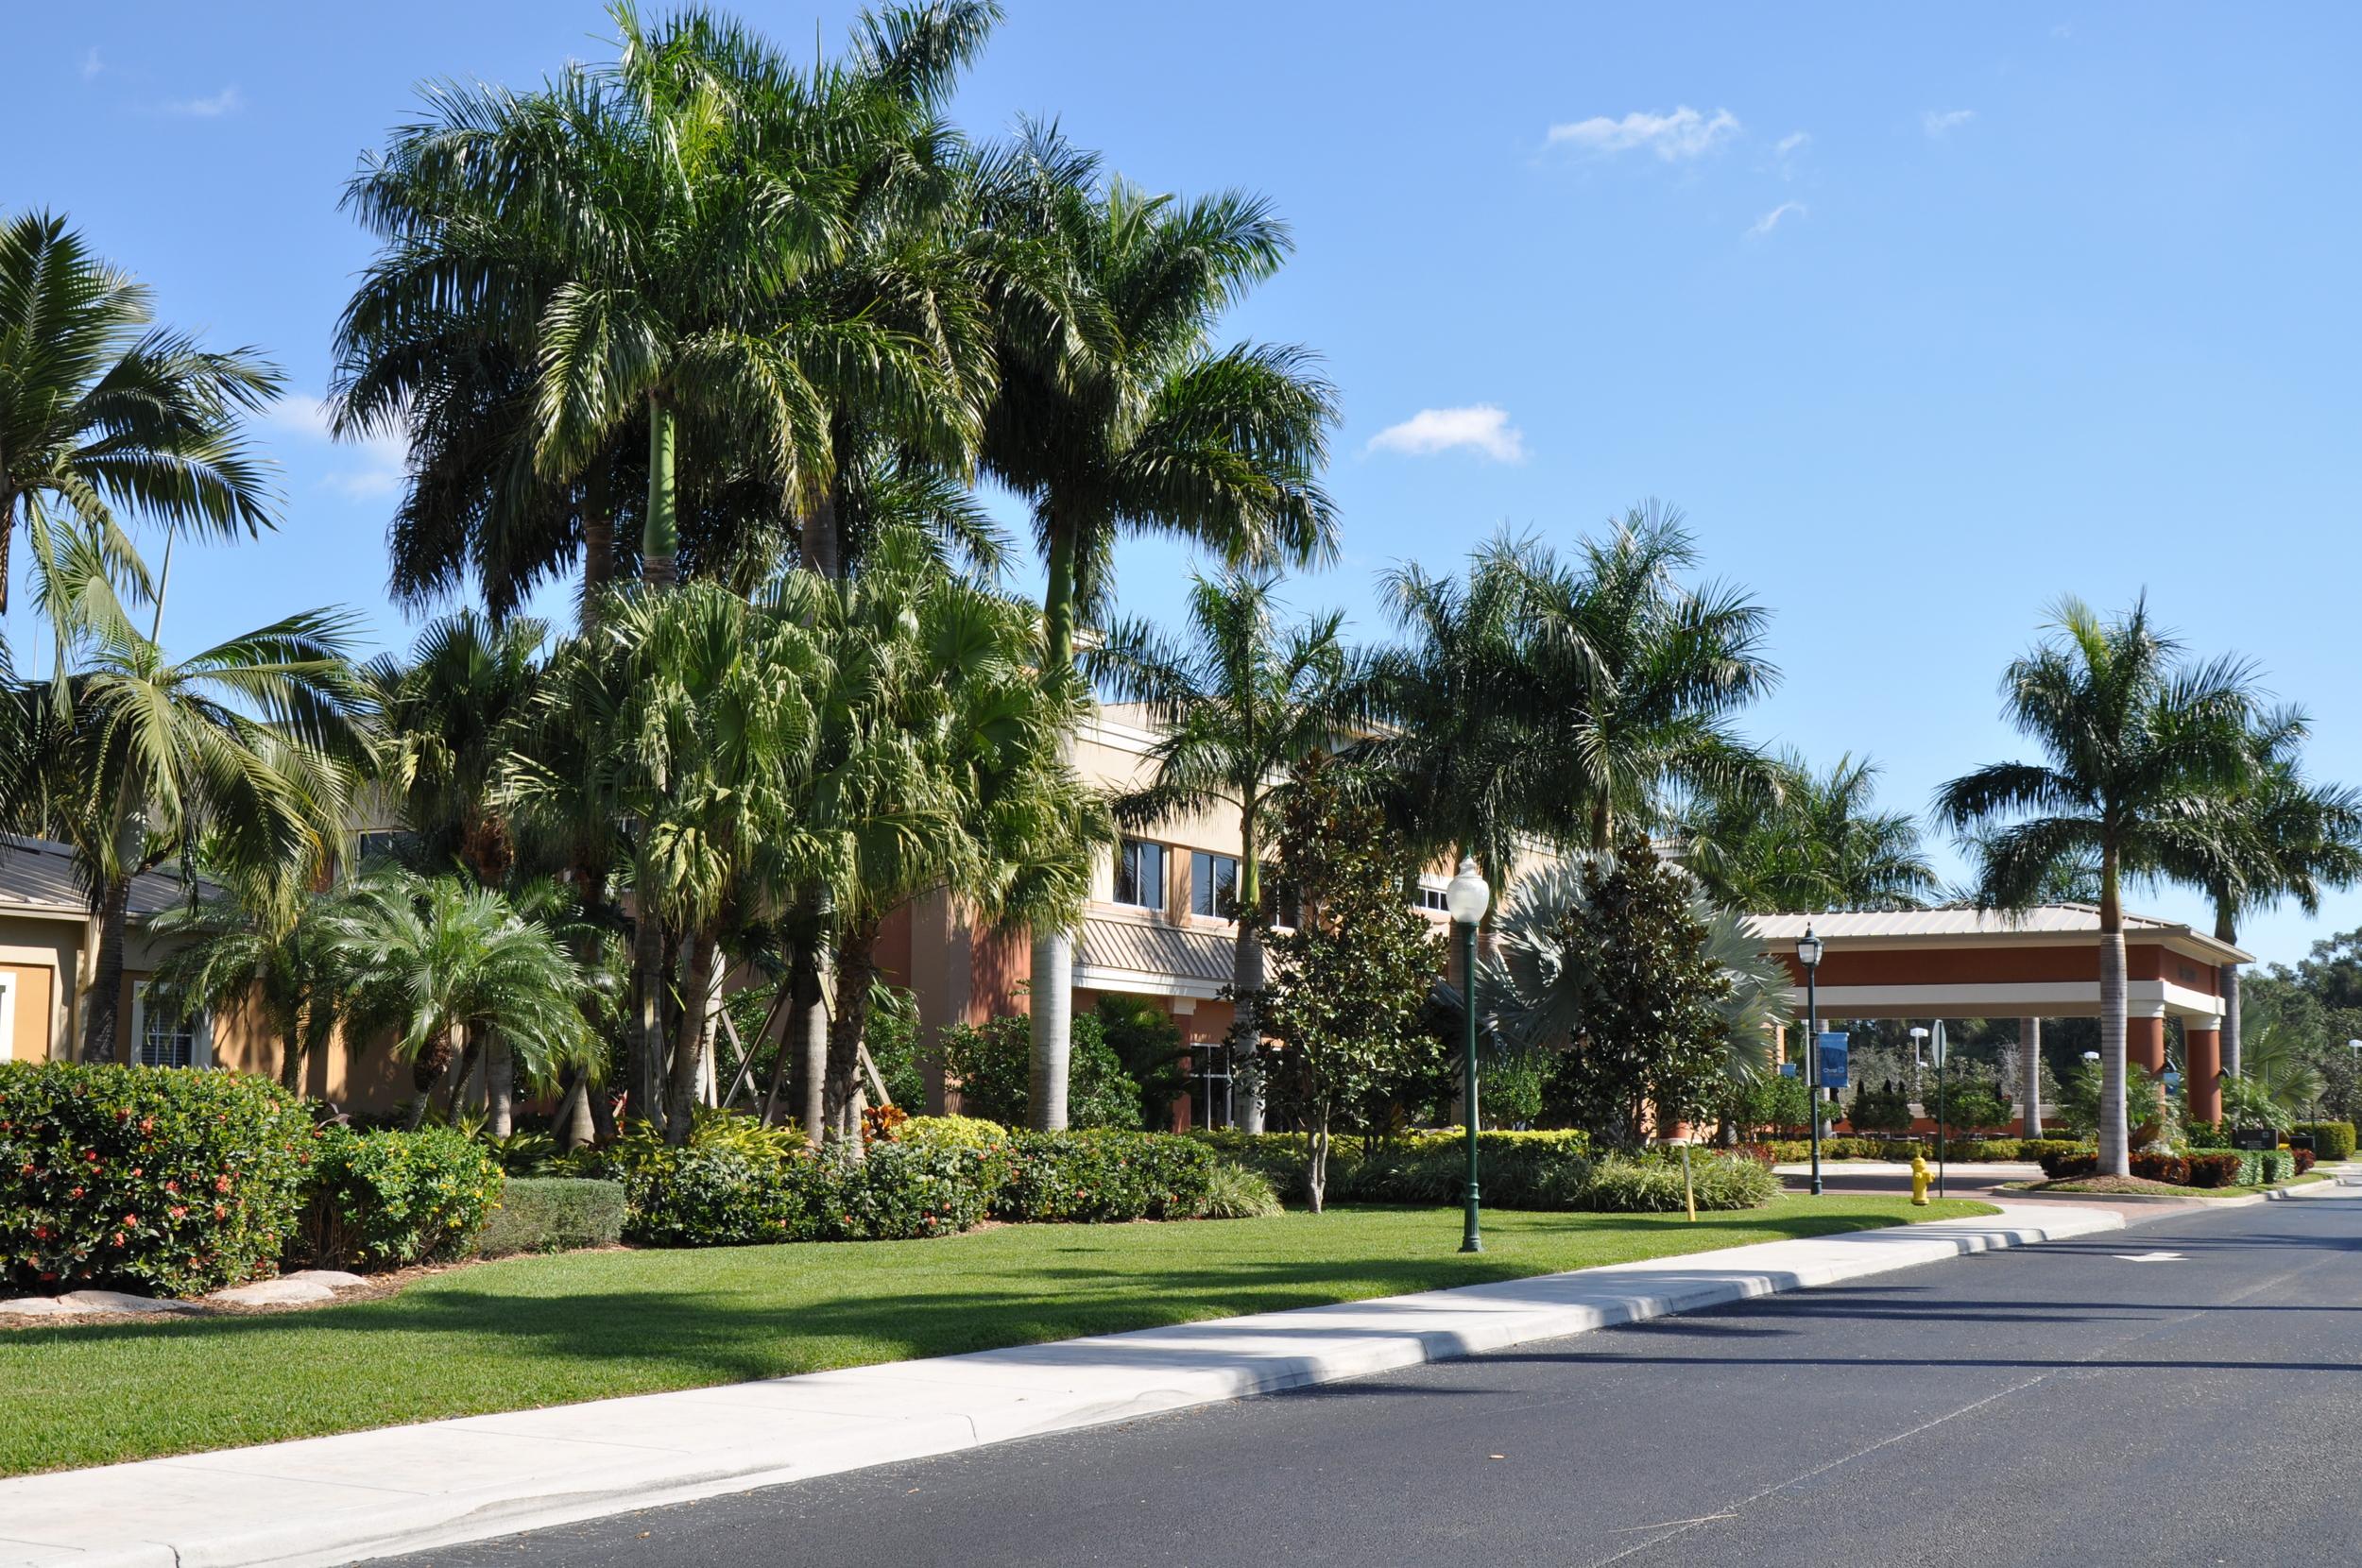 Christ Fellowship Church PBG Tropical Florida Landscaping.JPG